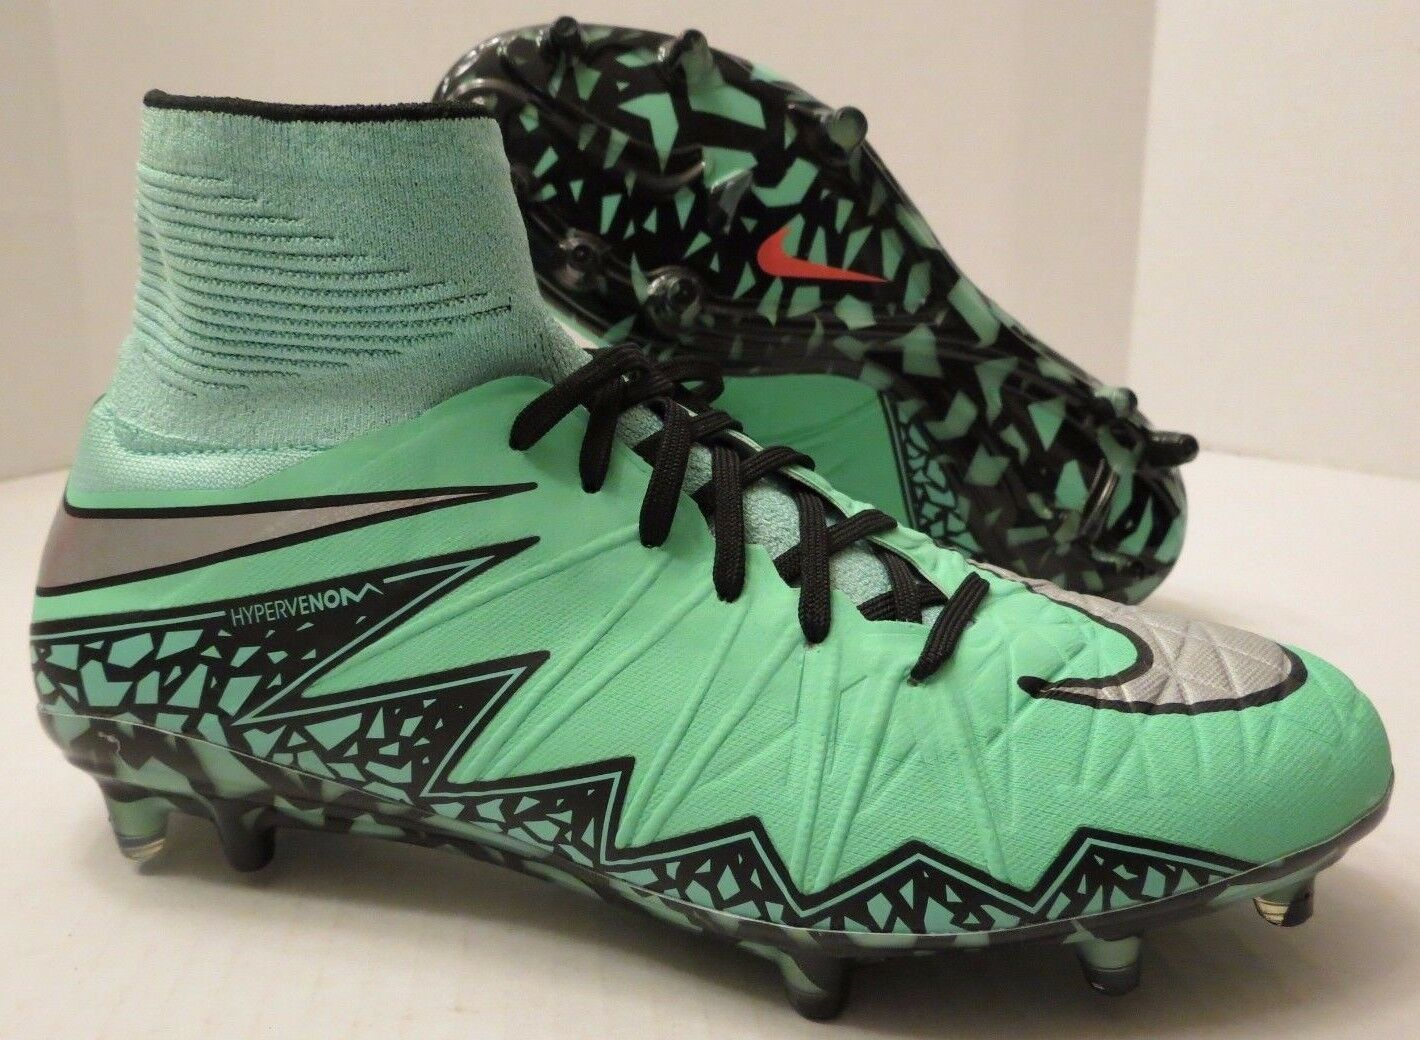 Nike hypervenom Phantom II 2 FG soccer cleats 747213 308 precio Verde Glow reducción de precio 308 b0e51e